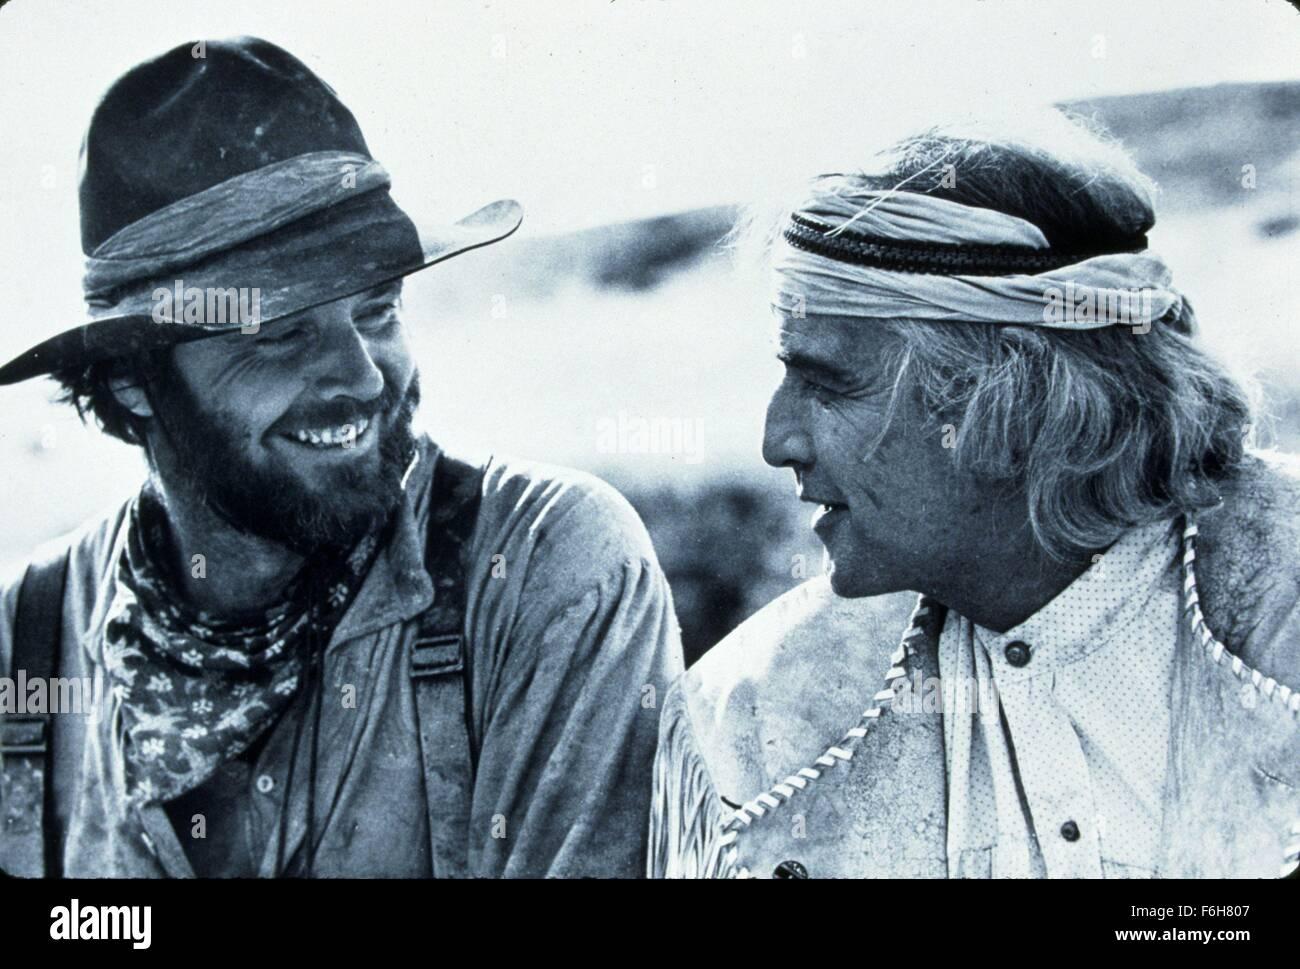 1976, Film Title: MISSOURI BREAKS, Pictured: BEARD, MARLON BRANDO, COWBOY, HAT, MOUSTACHE. (Credit Image: SNAP) - Stock Image